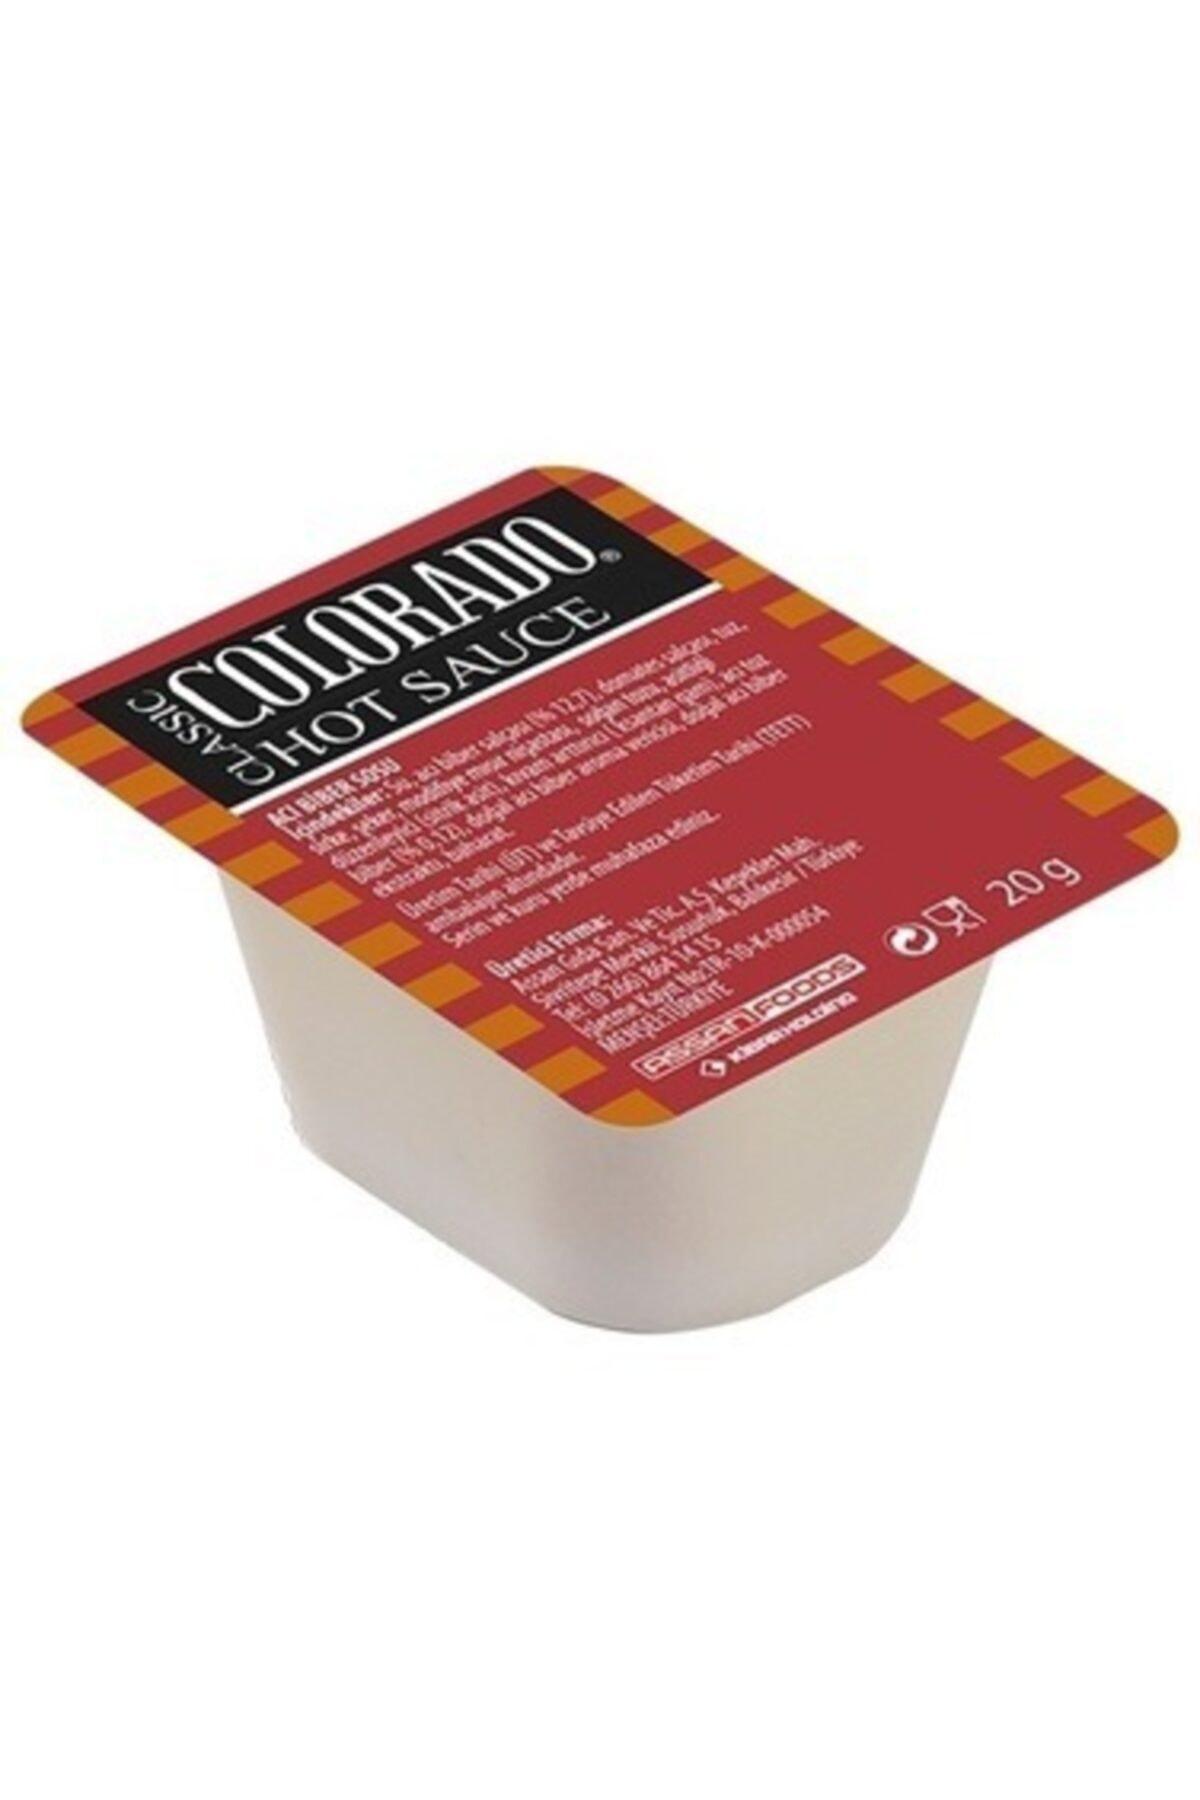 Küvet Acı Biber (Hot Chili) Sosu 20 gr*120